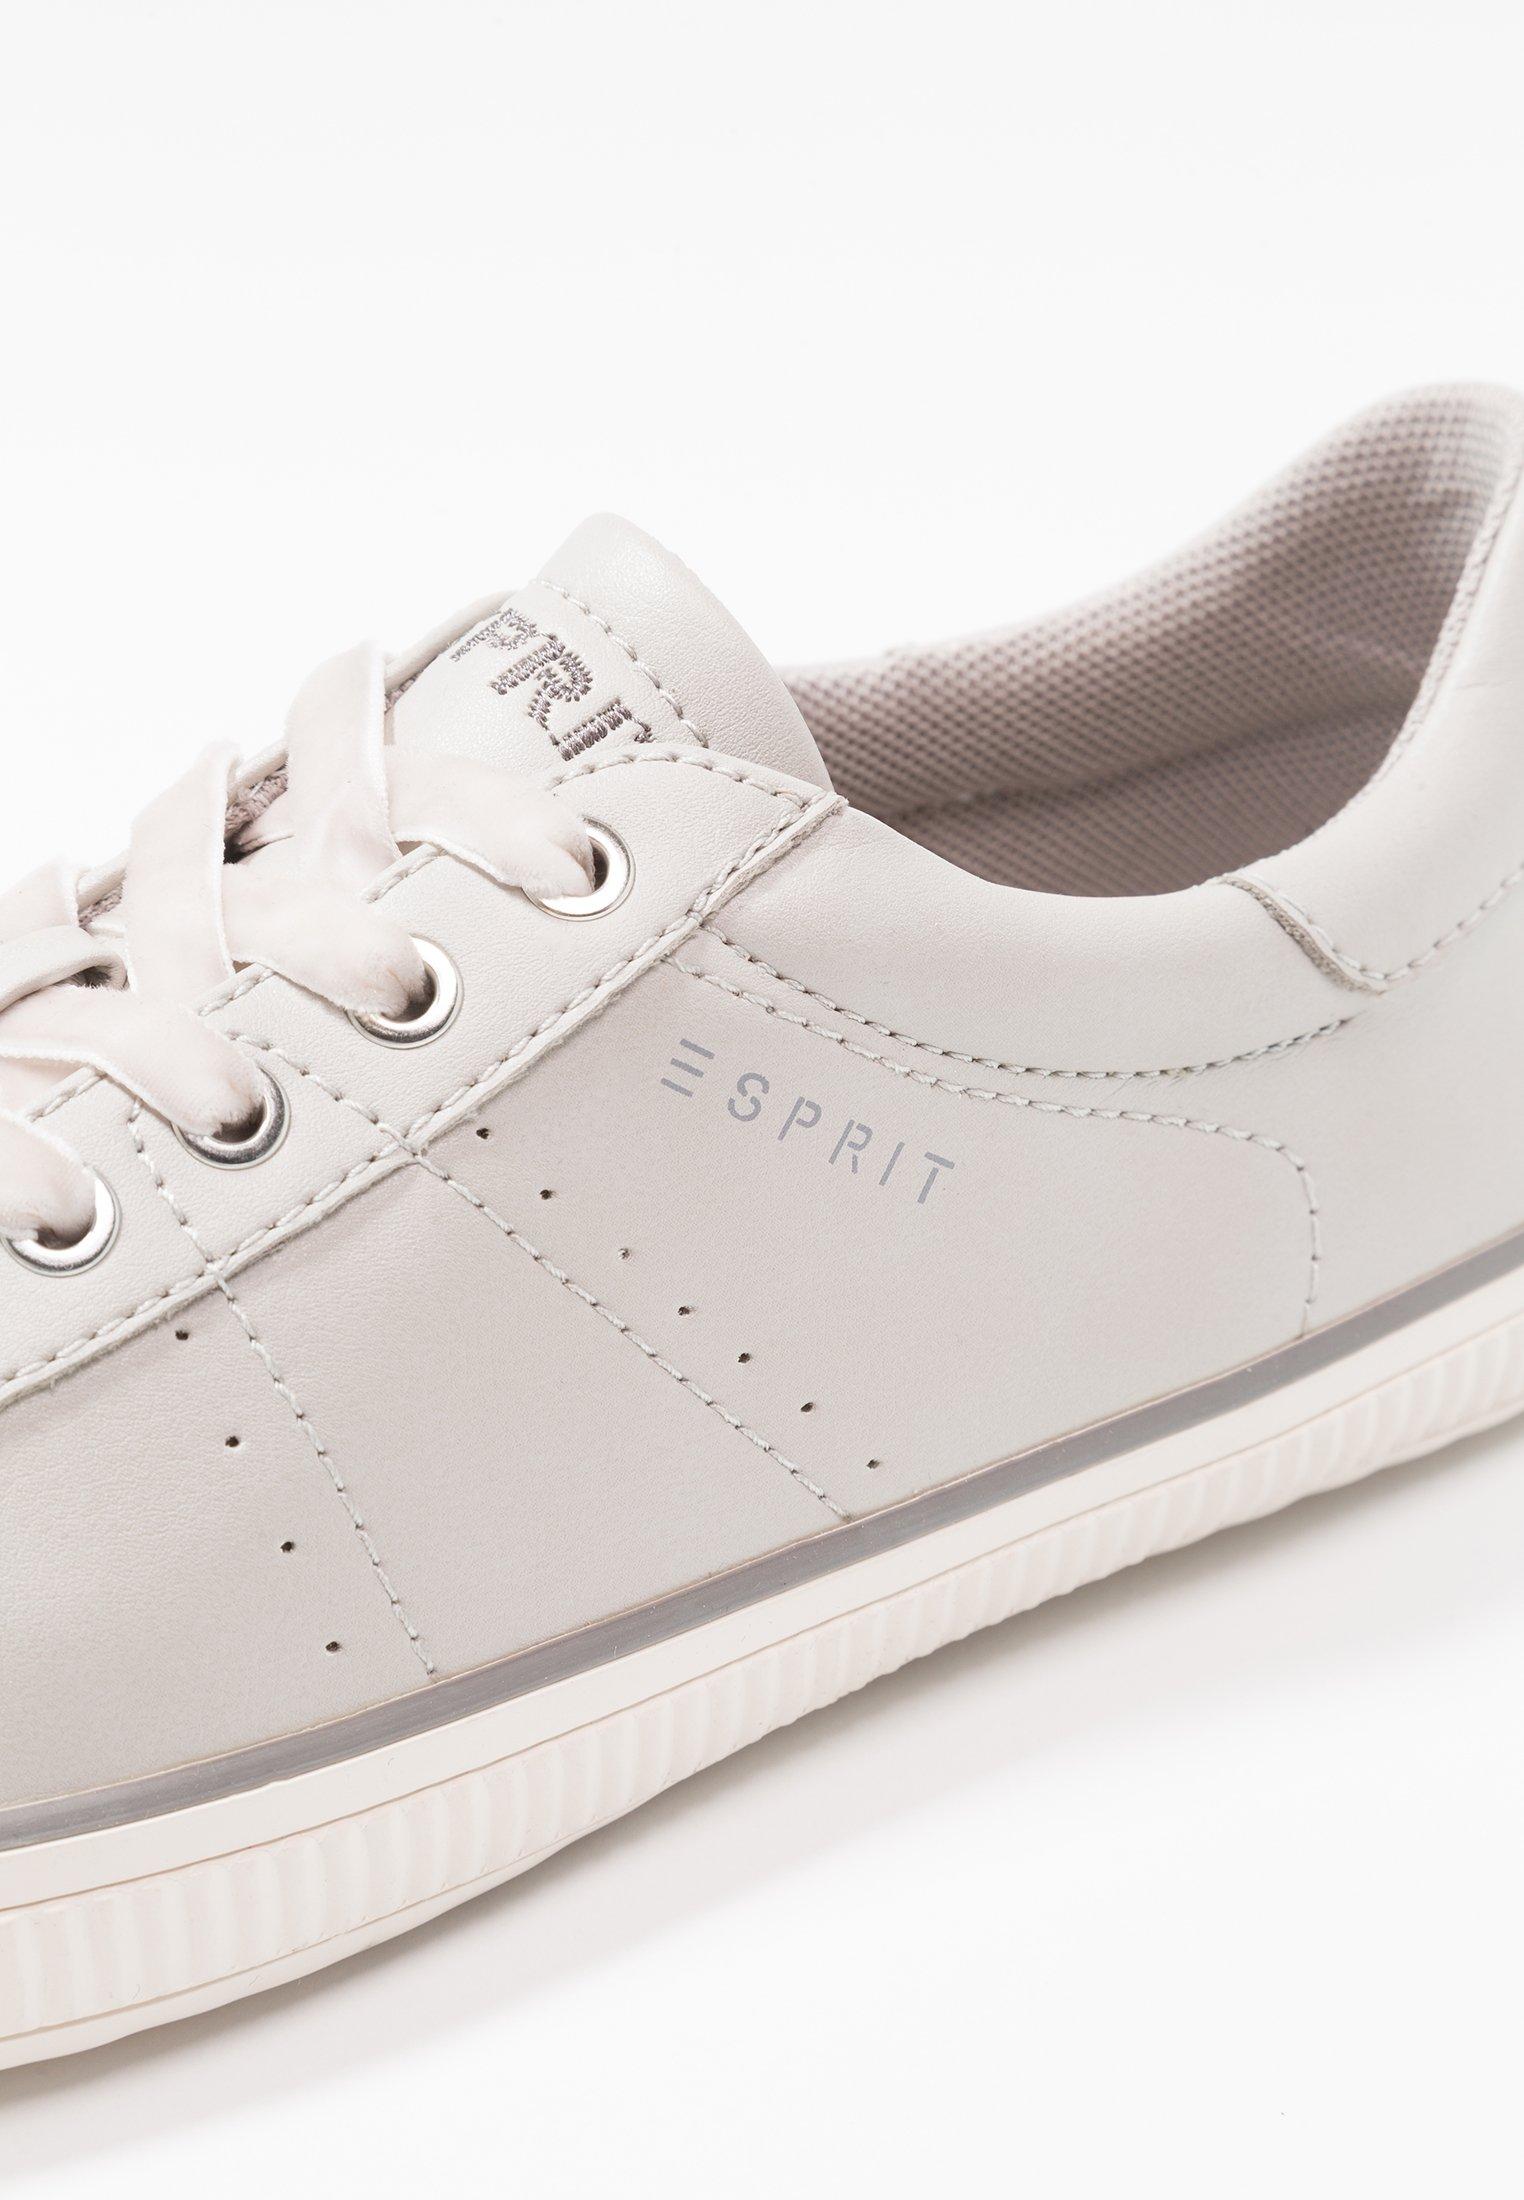 Basses Esprit MininaBaskets Grey Pastel Esprit Basses Grey MininaBaskets Pastel Esprit MininaBaskets Pastel Basses YfI6b7yvg